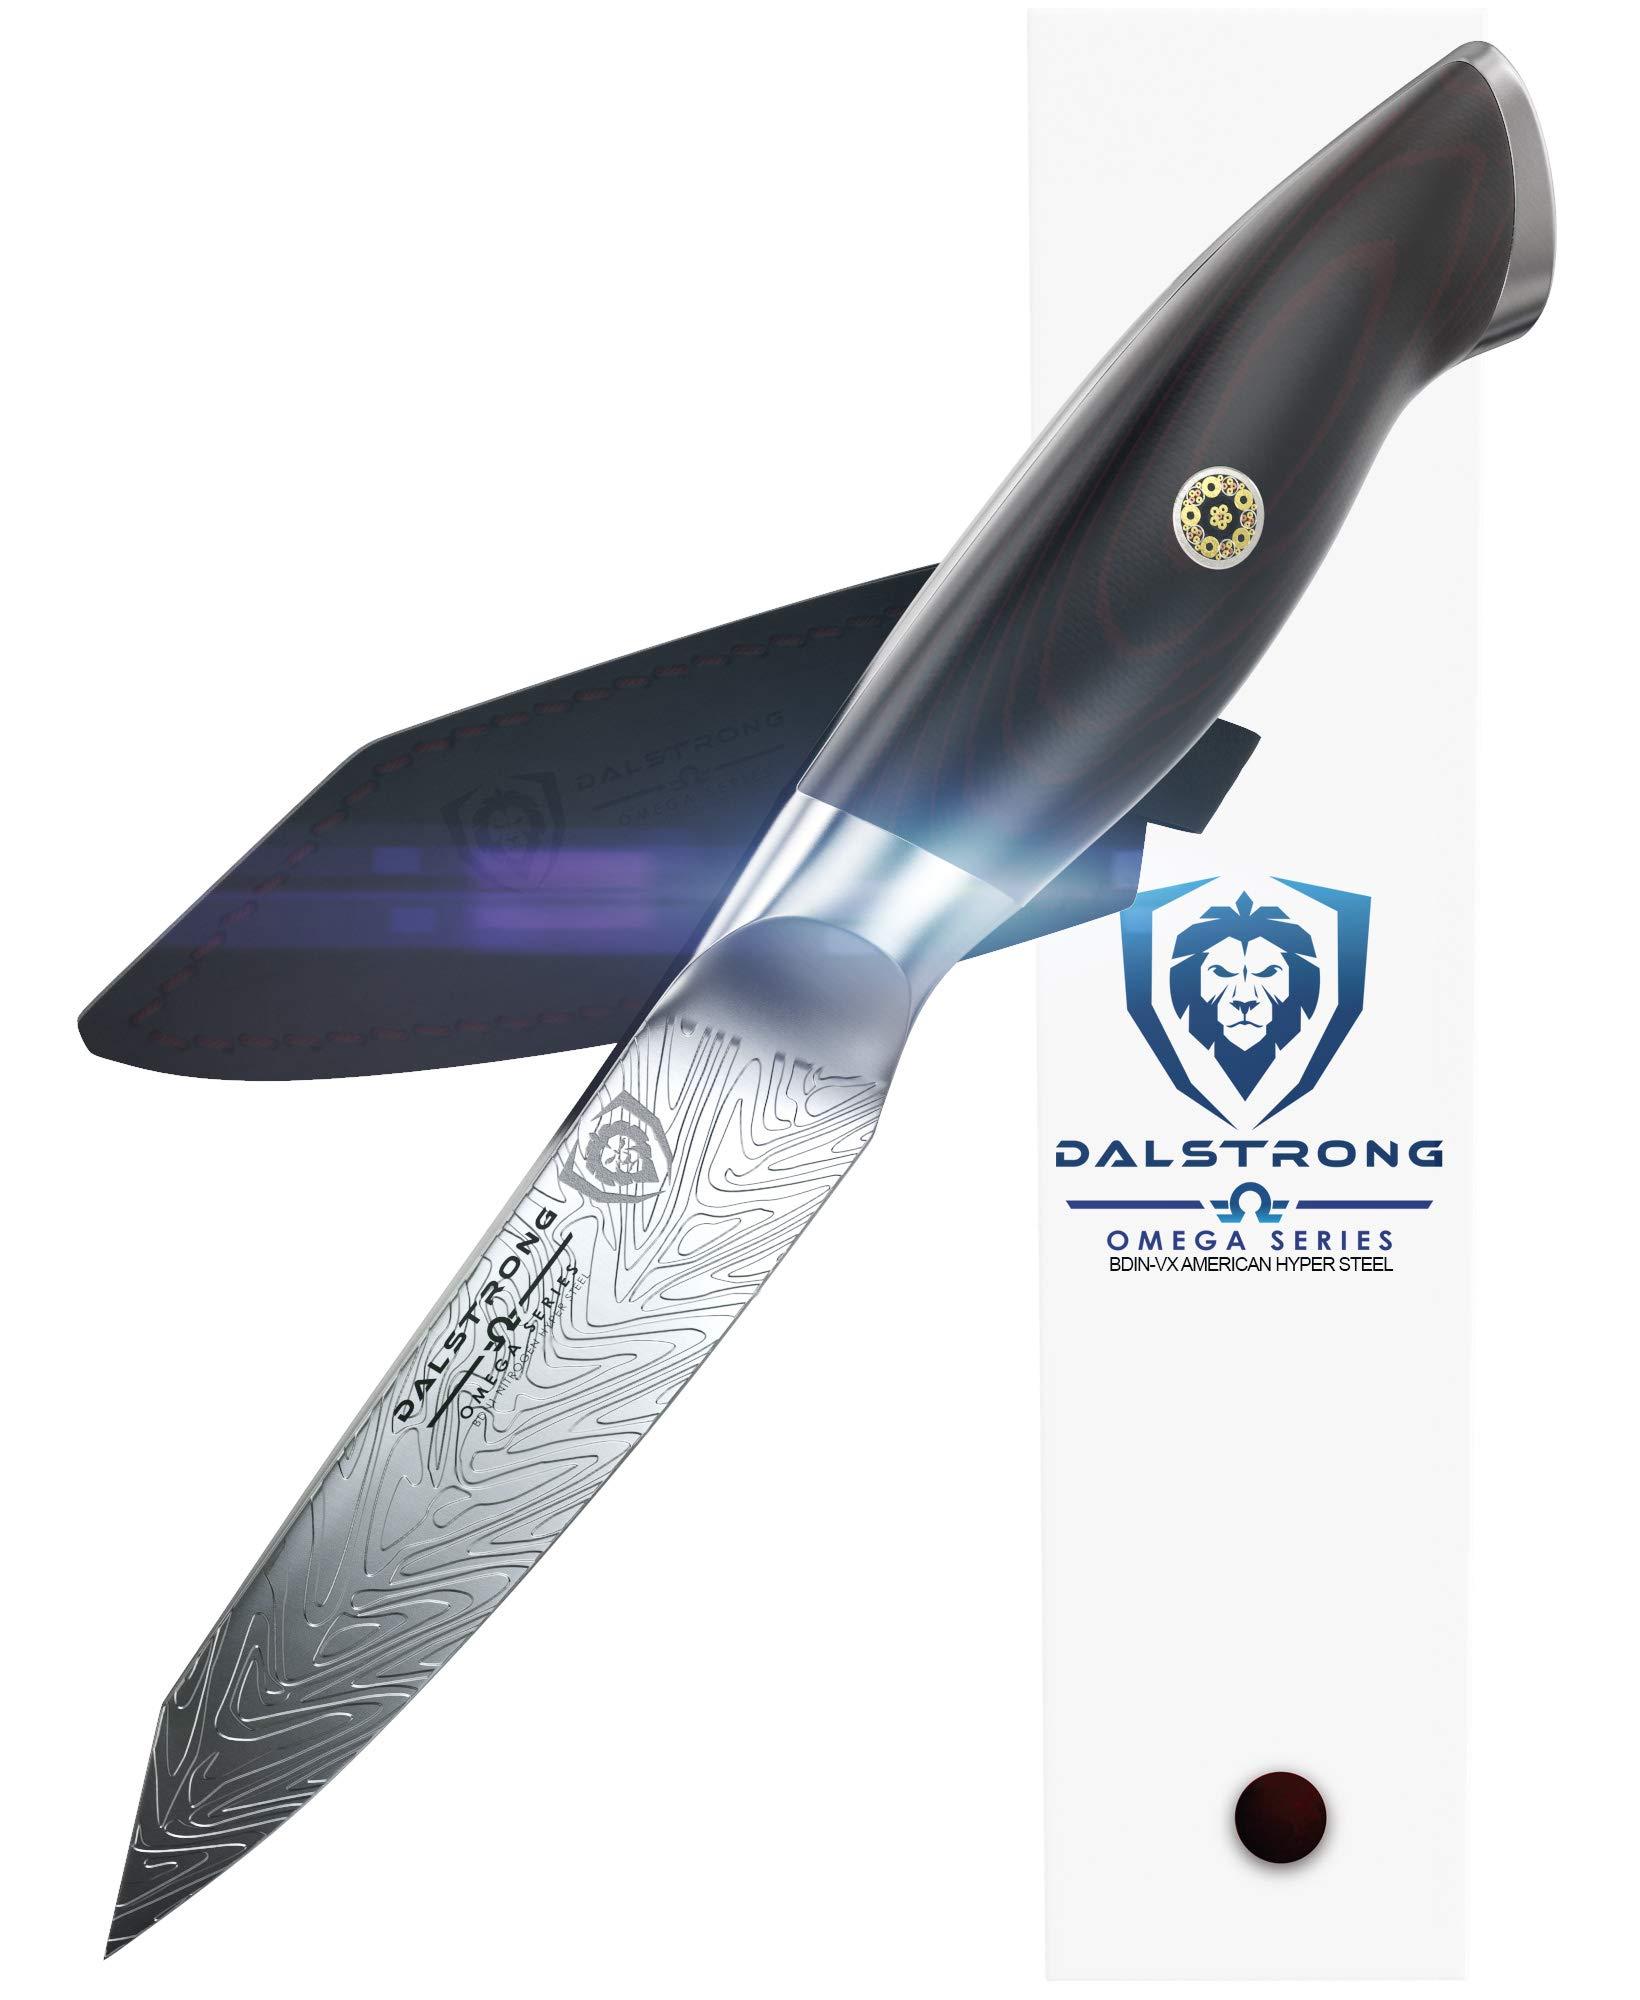 DALSTRONG Paring Knife - Omega Series - BD1N Steel- 4'' - w/Sheath